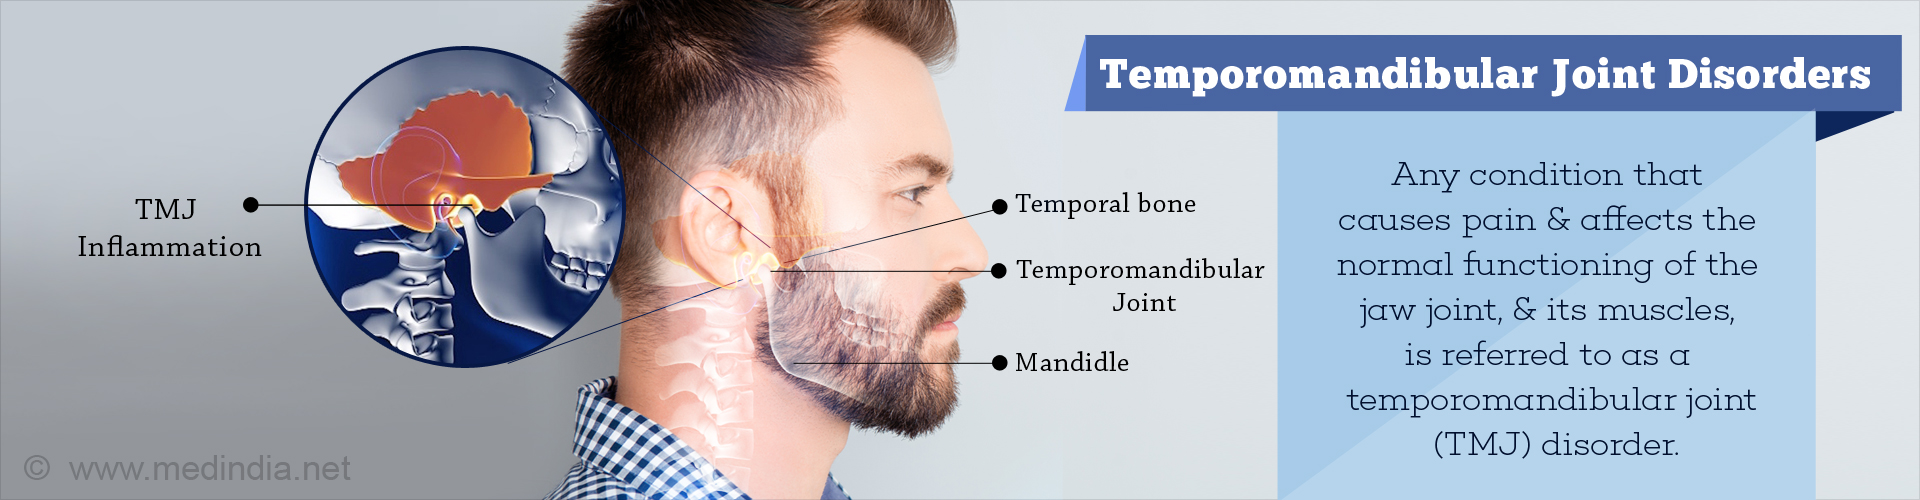 hight resolution of temporomandibular joint disorders causes symptoms diagnosis treatment